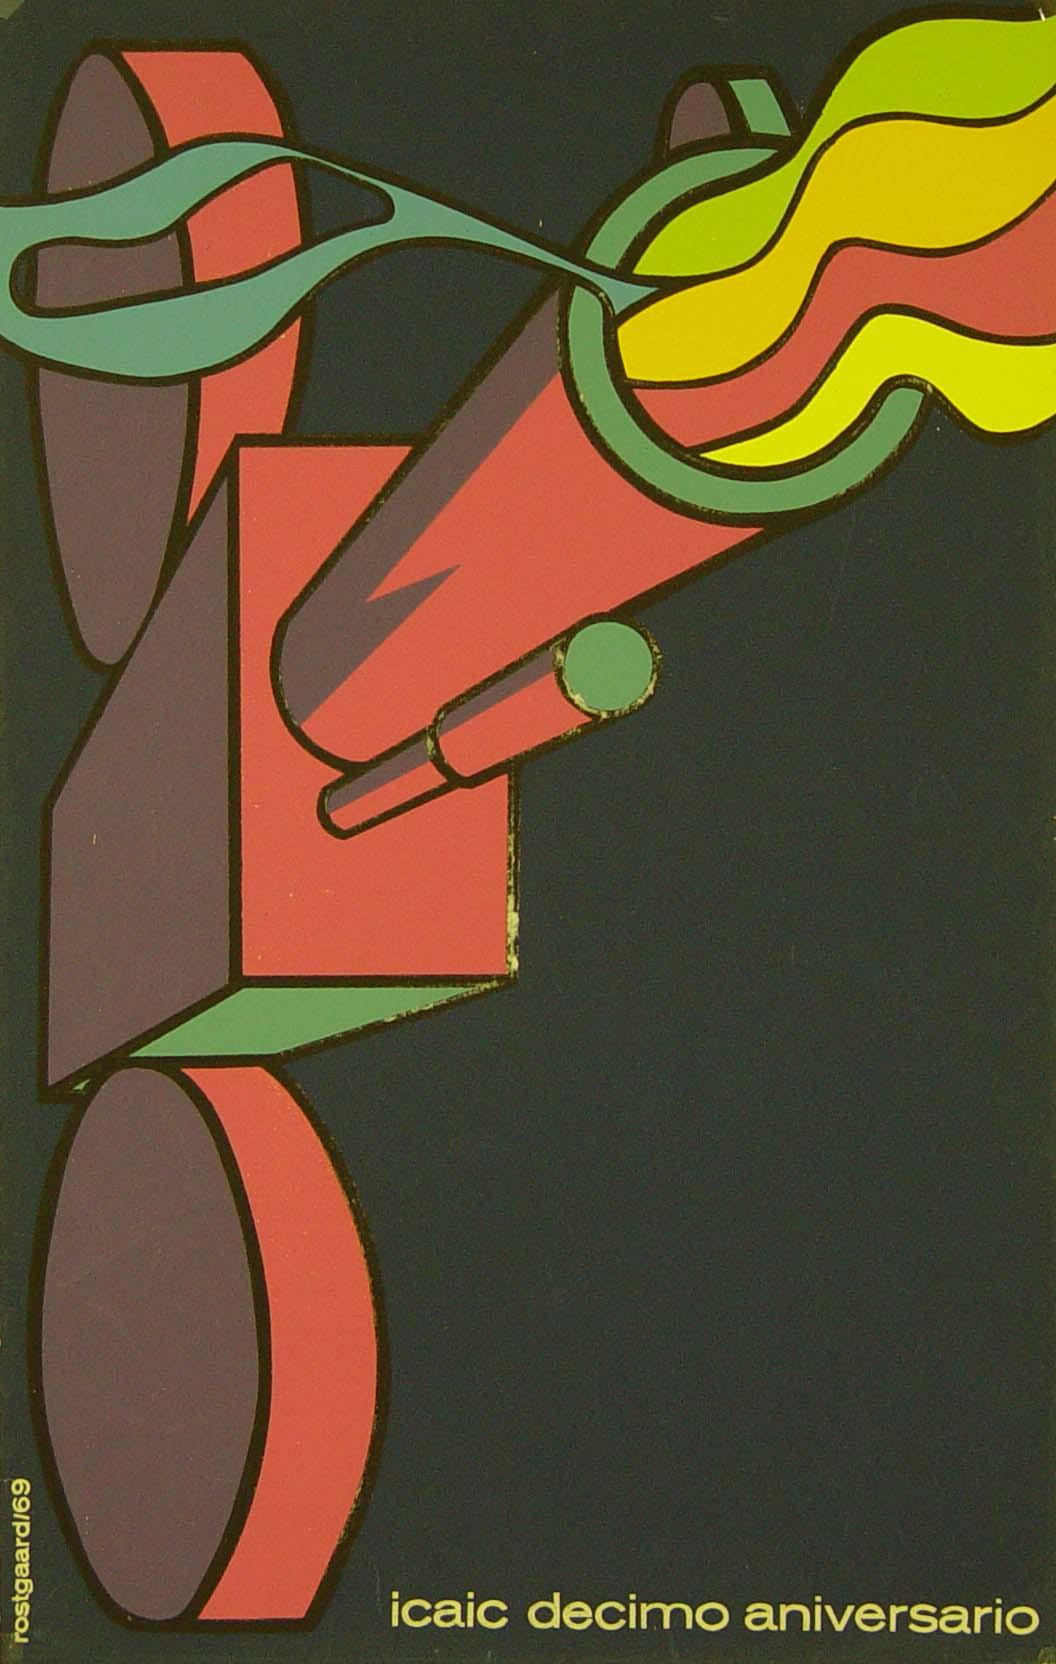 ICAIC Décimo Aniversario, Alfredo Rostgaard, 1969